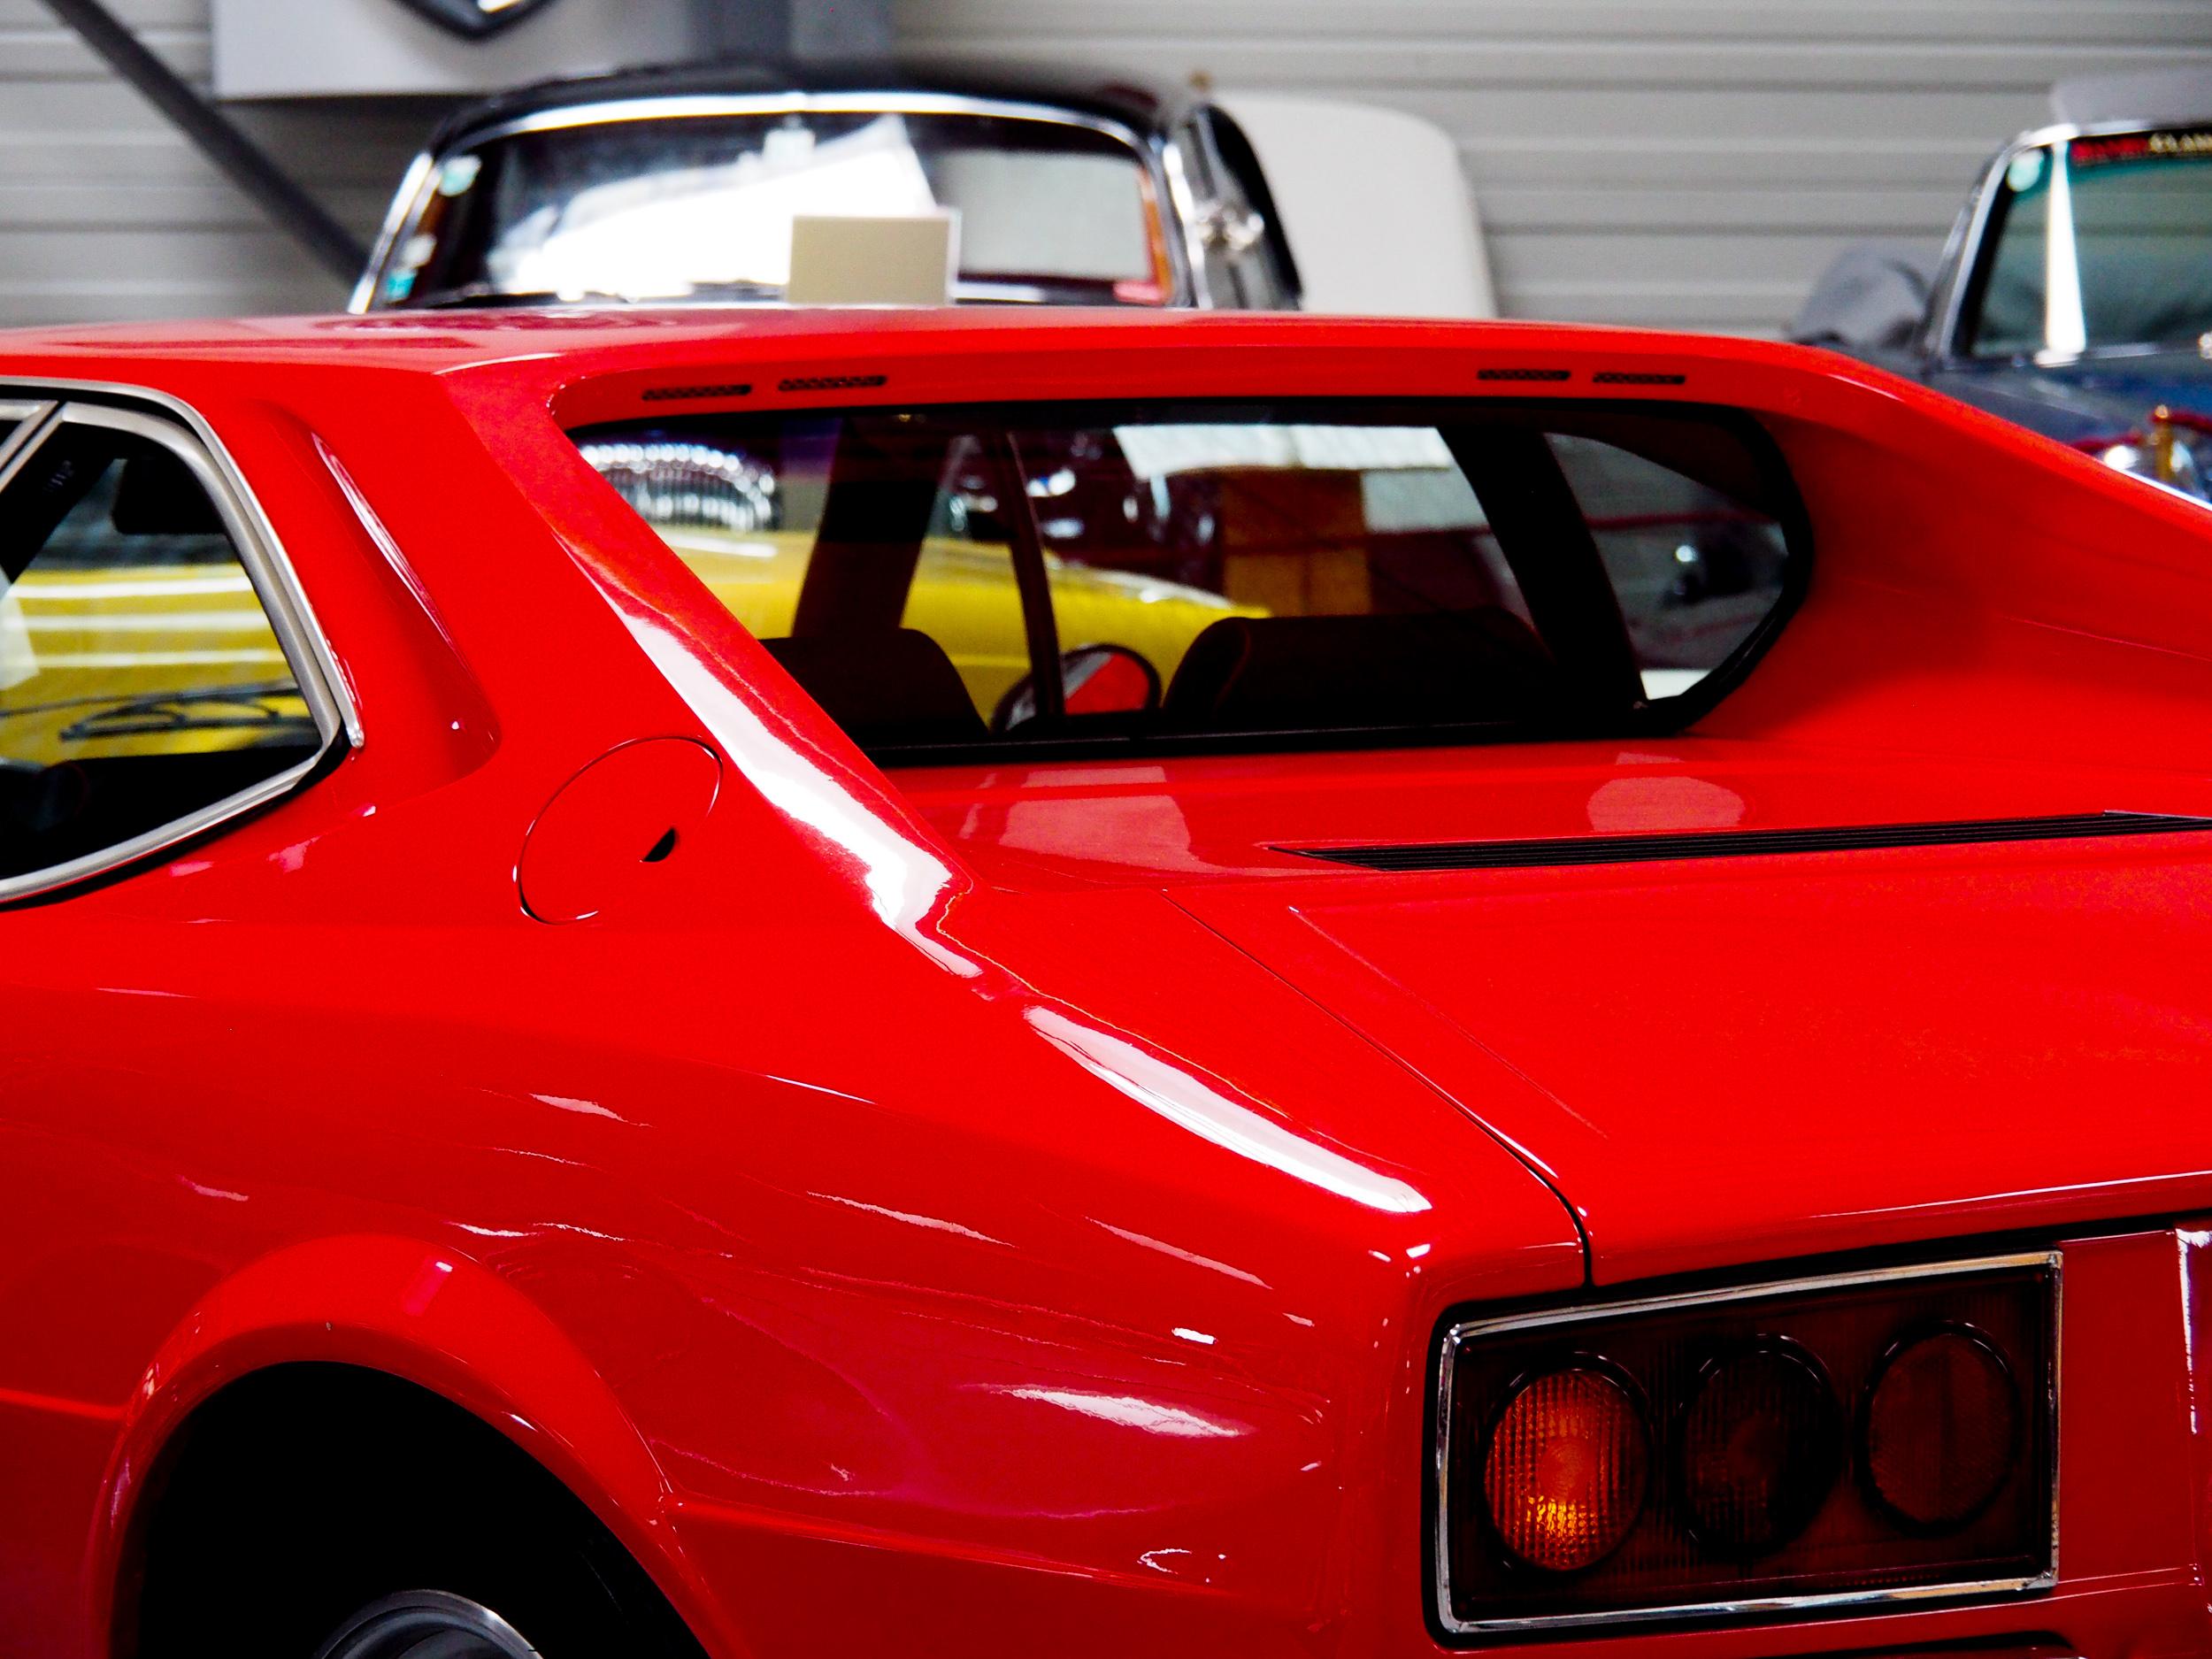 Ferrari 308 GT4 Dino 'Bertone' Bj. 1977 - ex Udo Böschmann